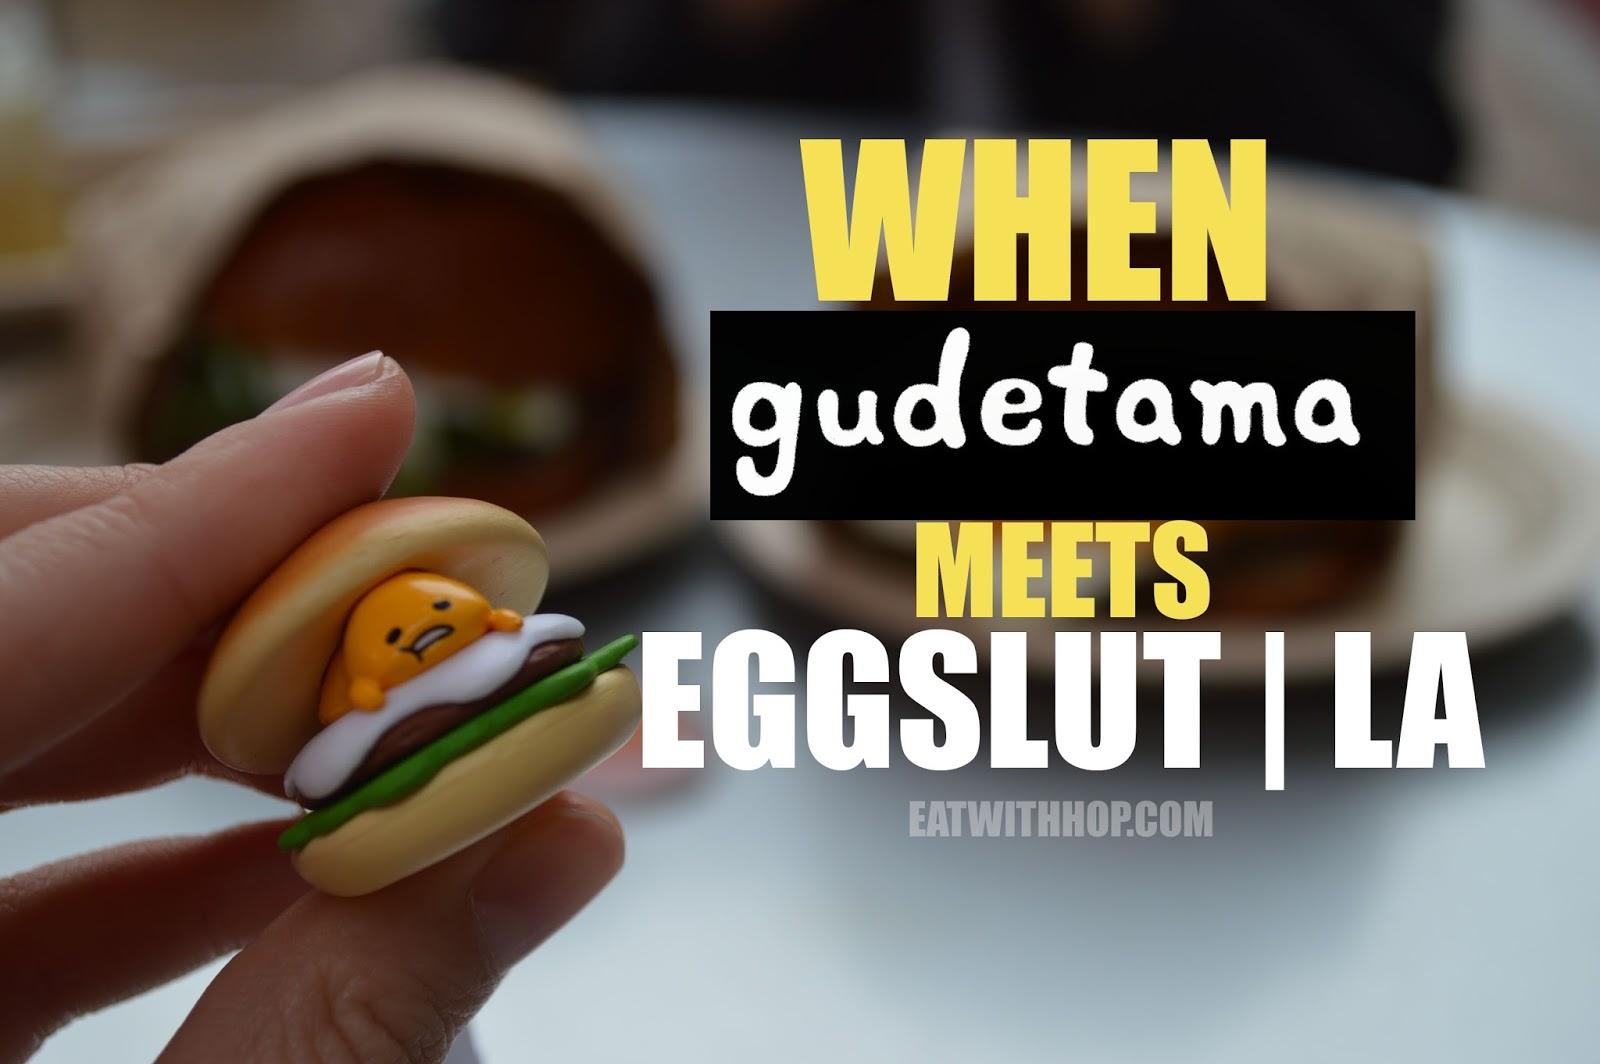 GUDETAMA GOT A LITTLE SLUTTY @ EGGSLUT - DOWNTOWN LA